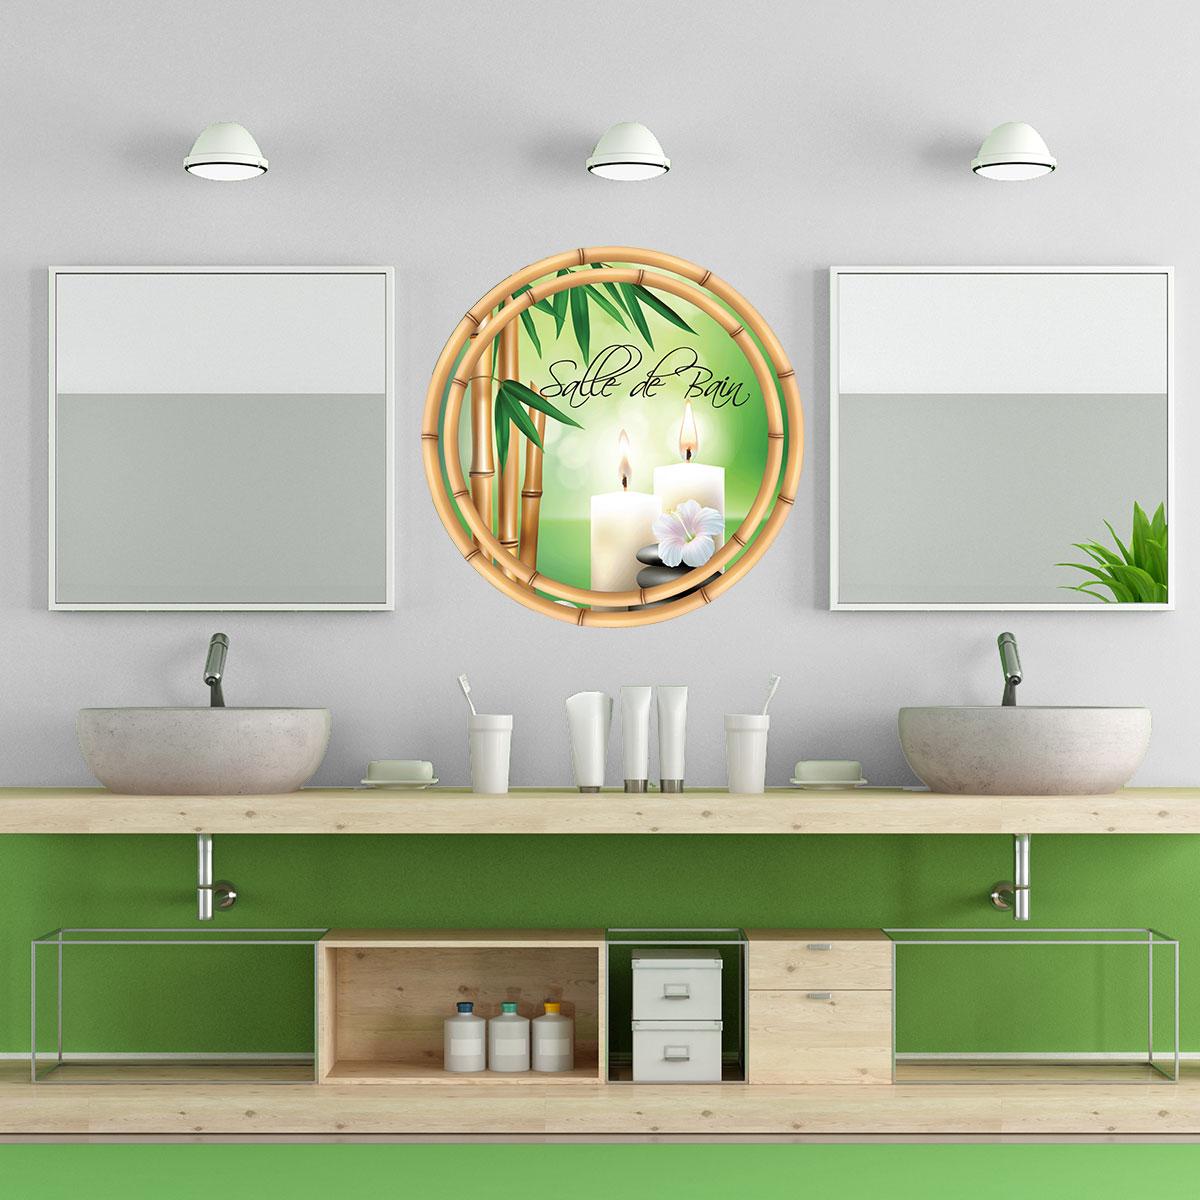 https://www.ambiance-sticker.com/sticker-dans-mon-bain-de-mousse ...